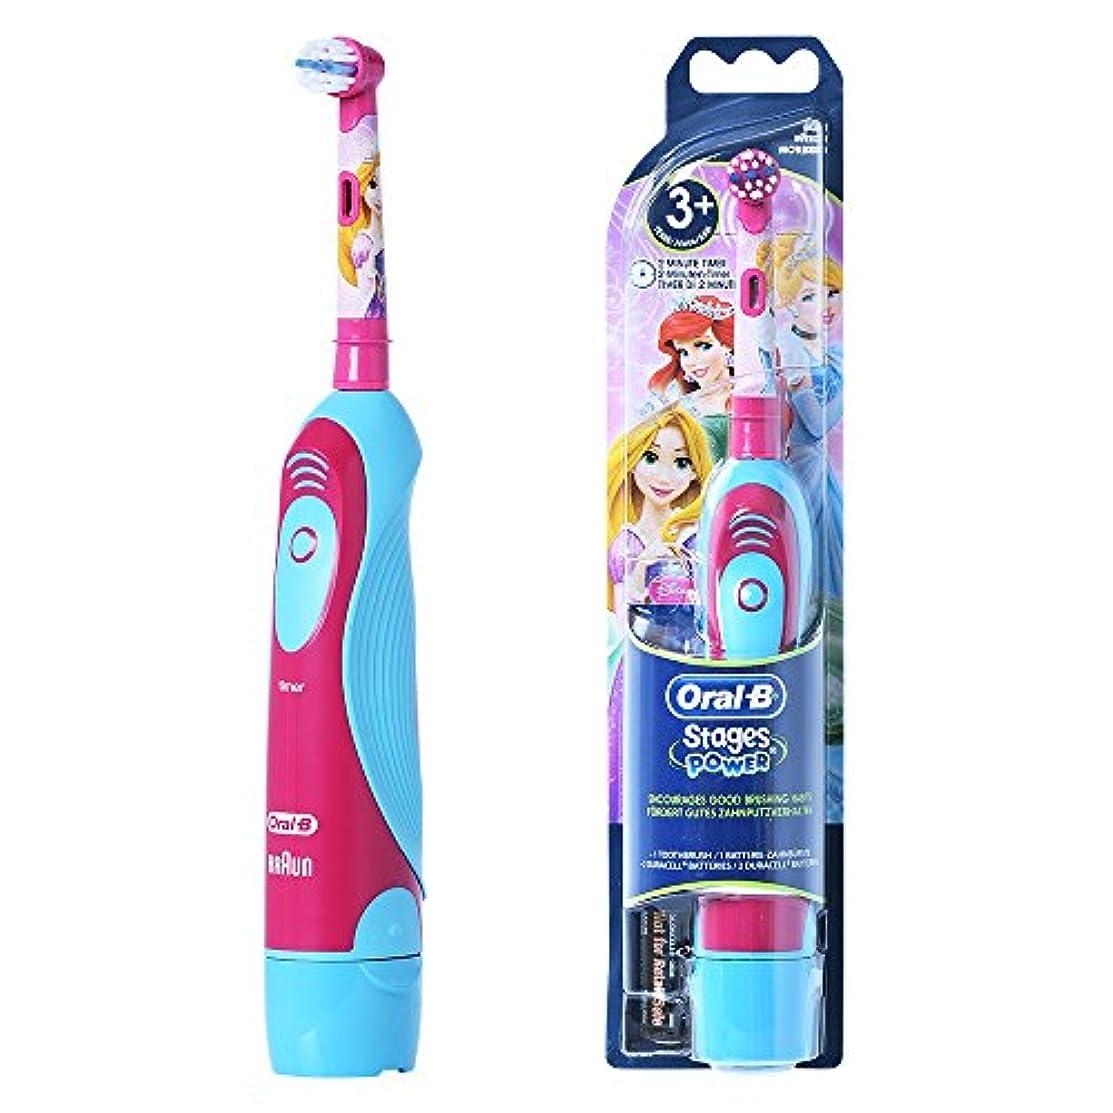 手頻繁に王女Braun Oral-B D2 D2010 Disney Princess Kids 電動歯ブラシ [並行輸入品]